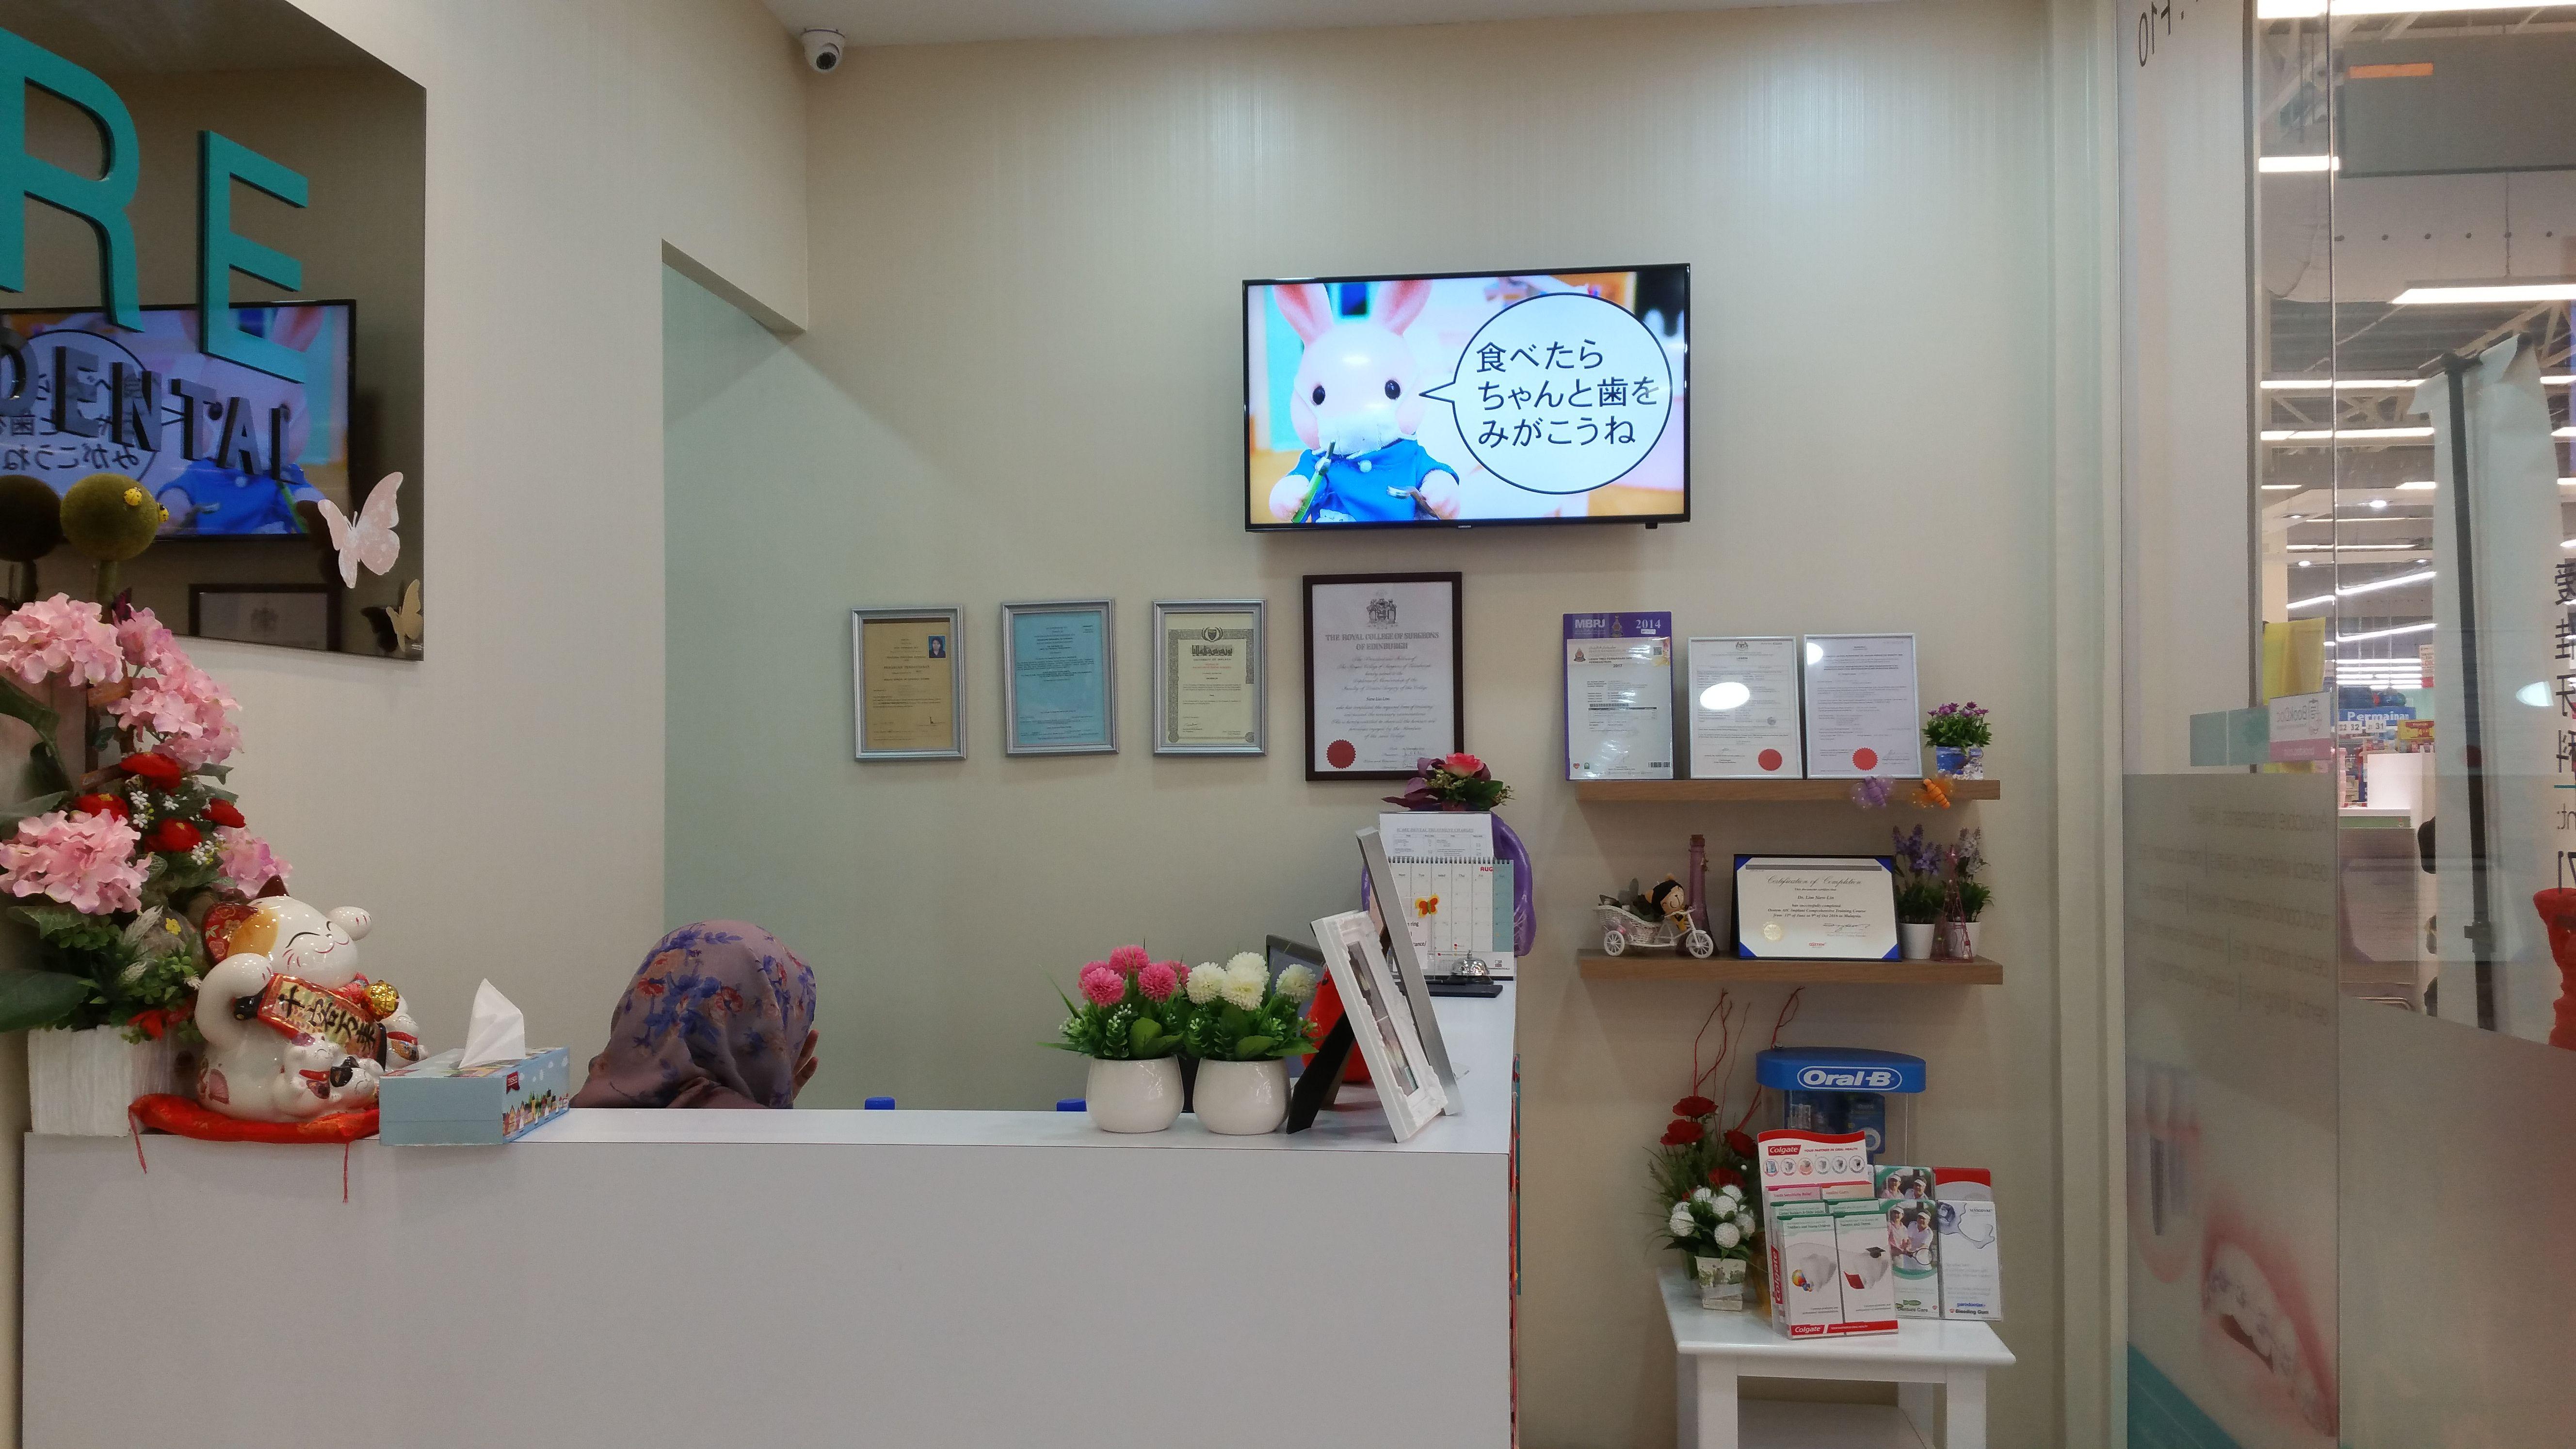 iCare Dental -  Tesco Ara Damansara